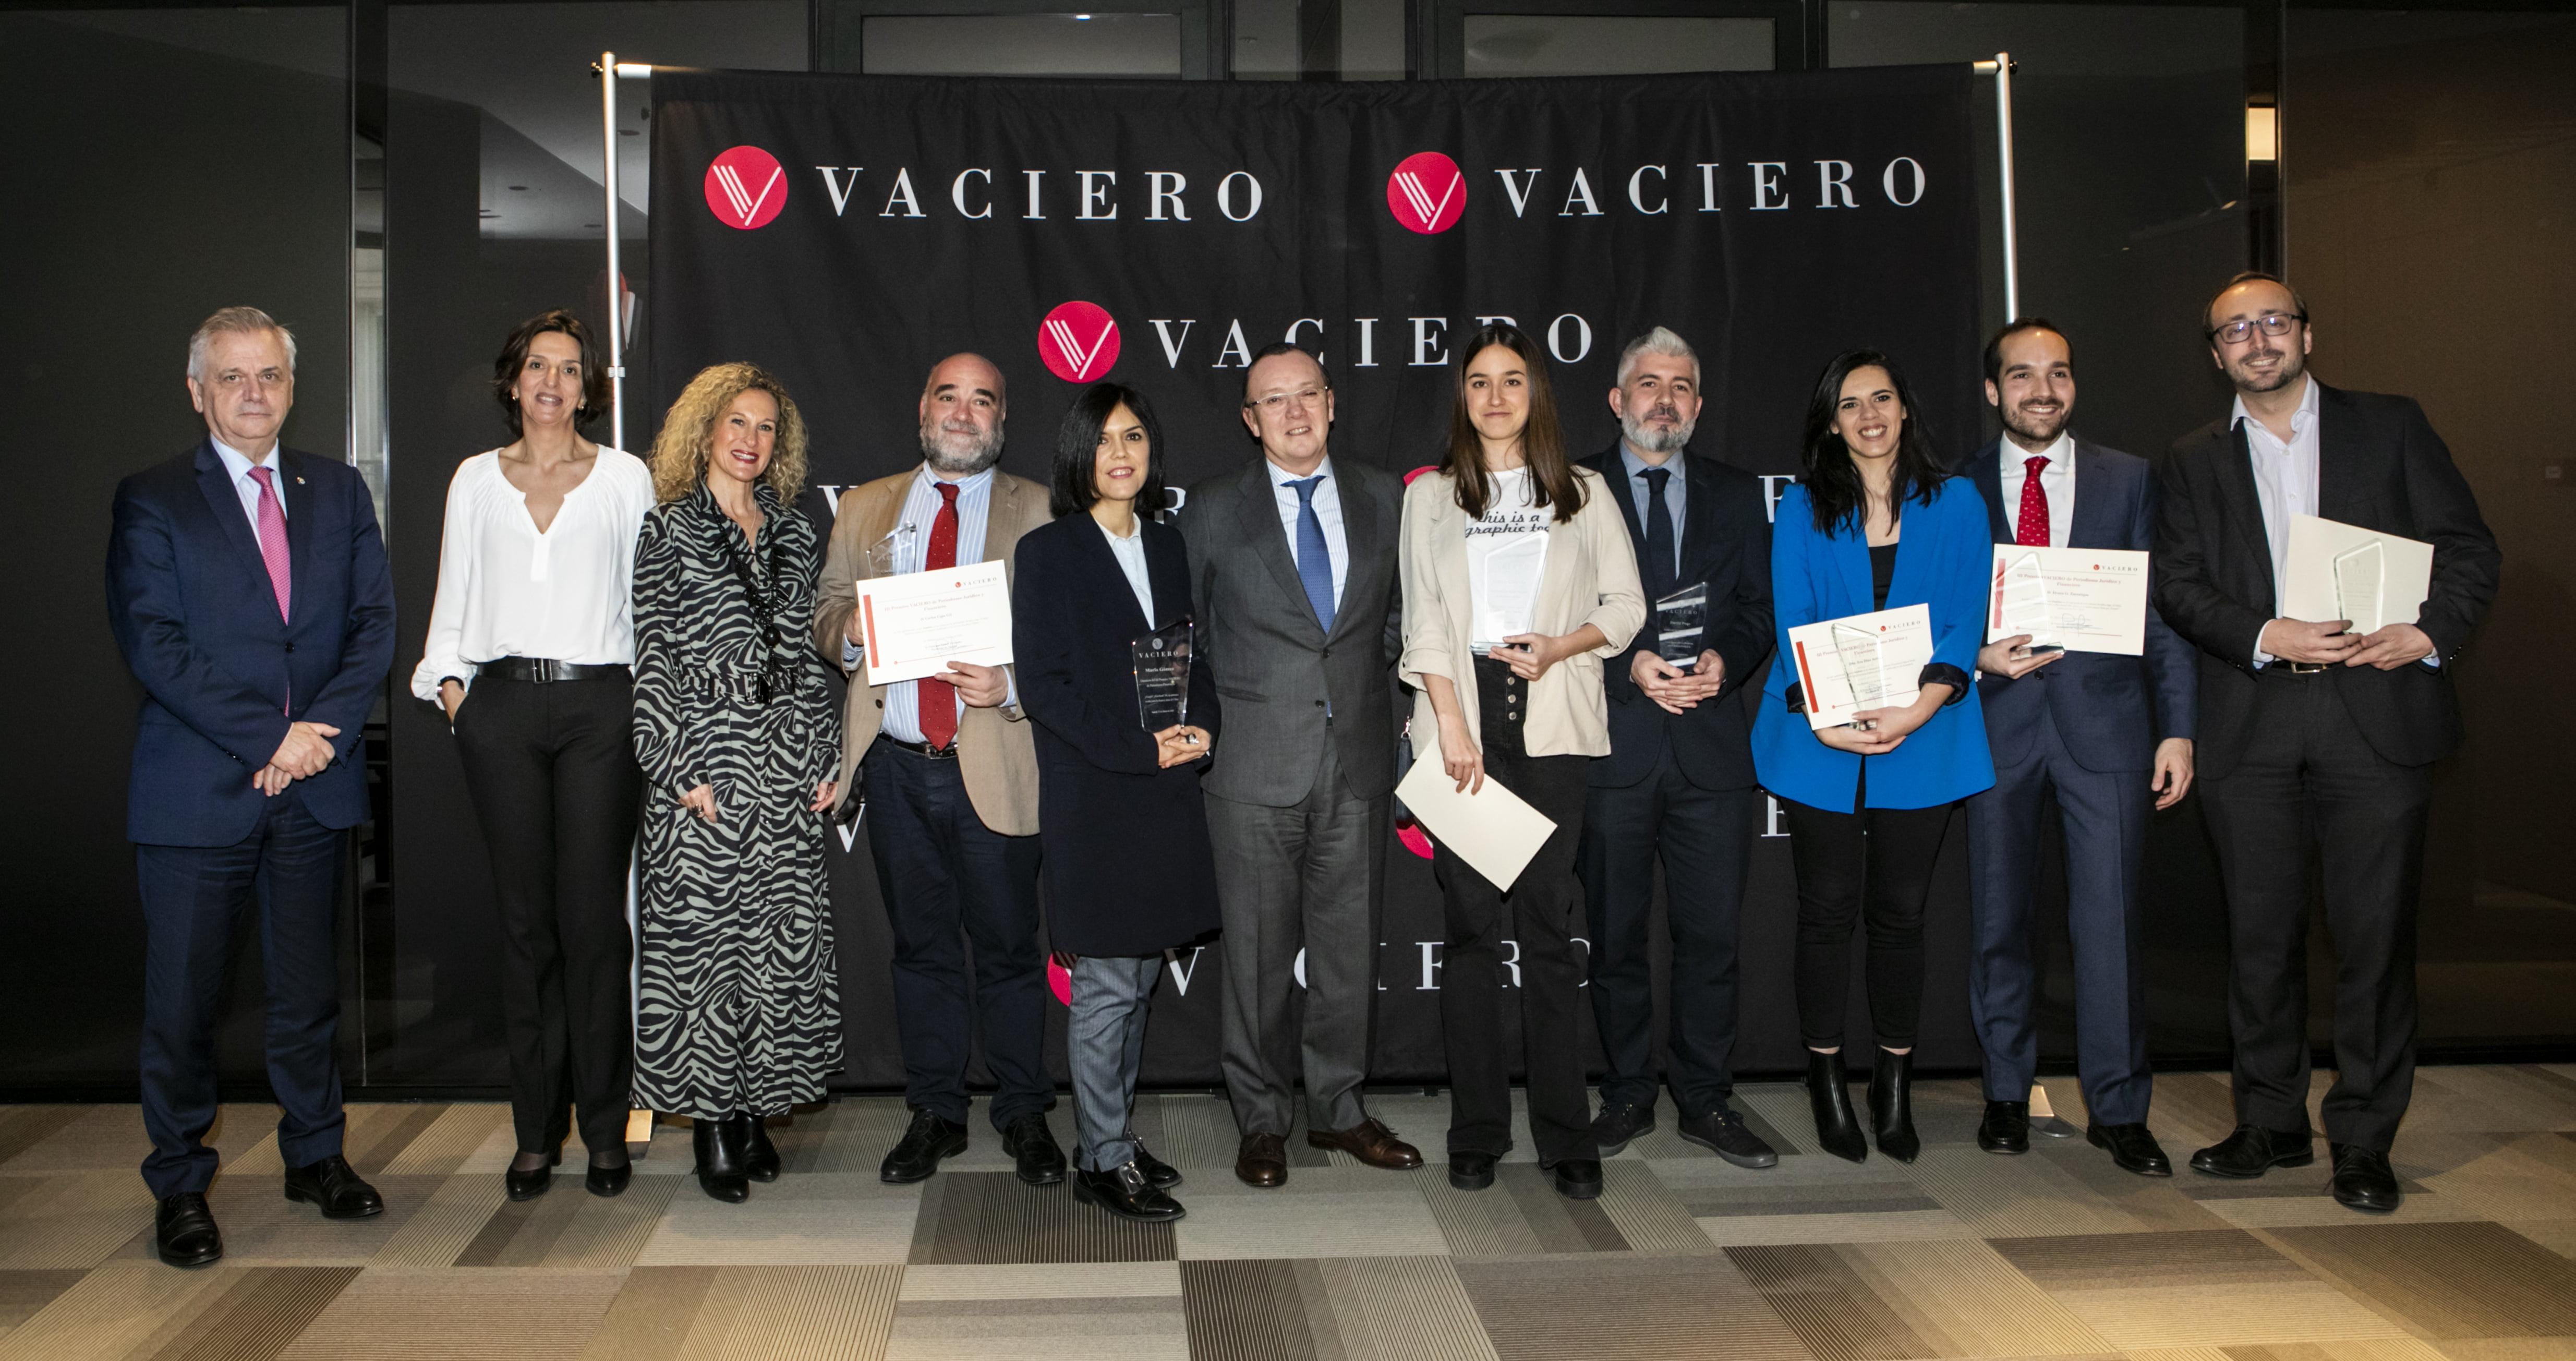 premios vaciero - diario juridico